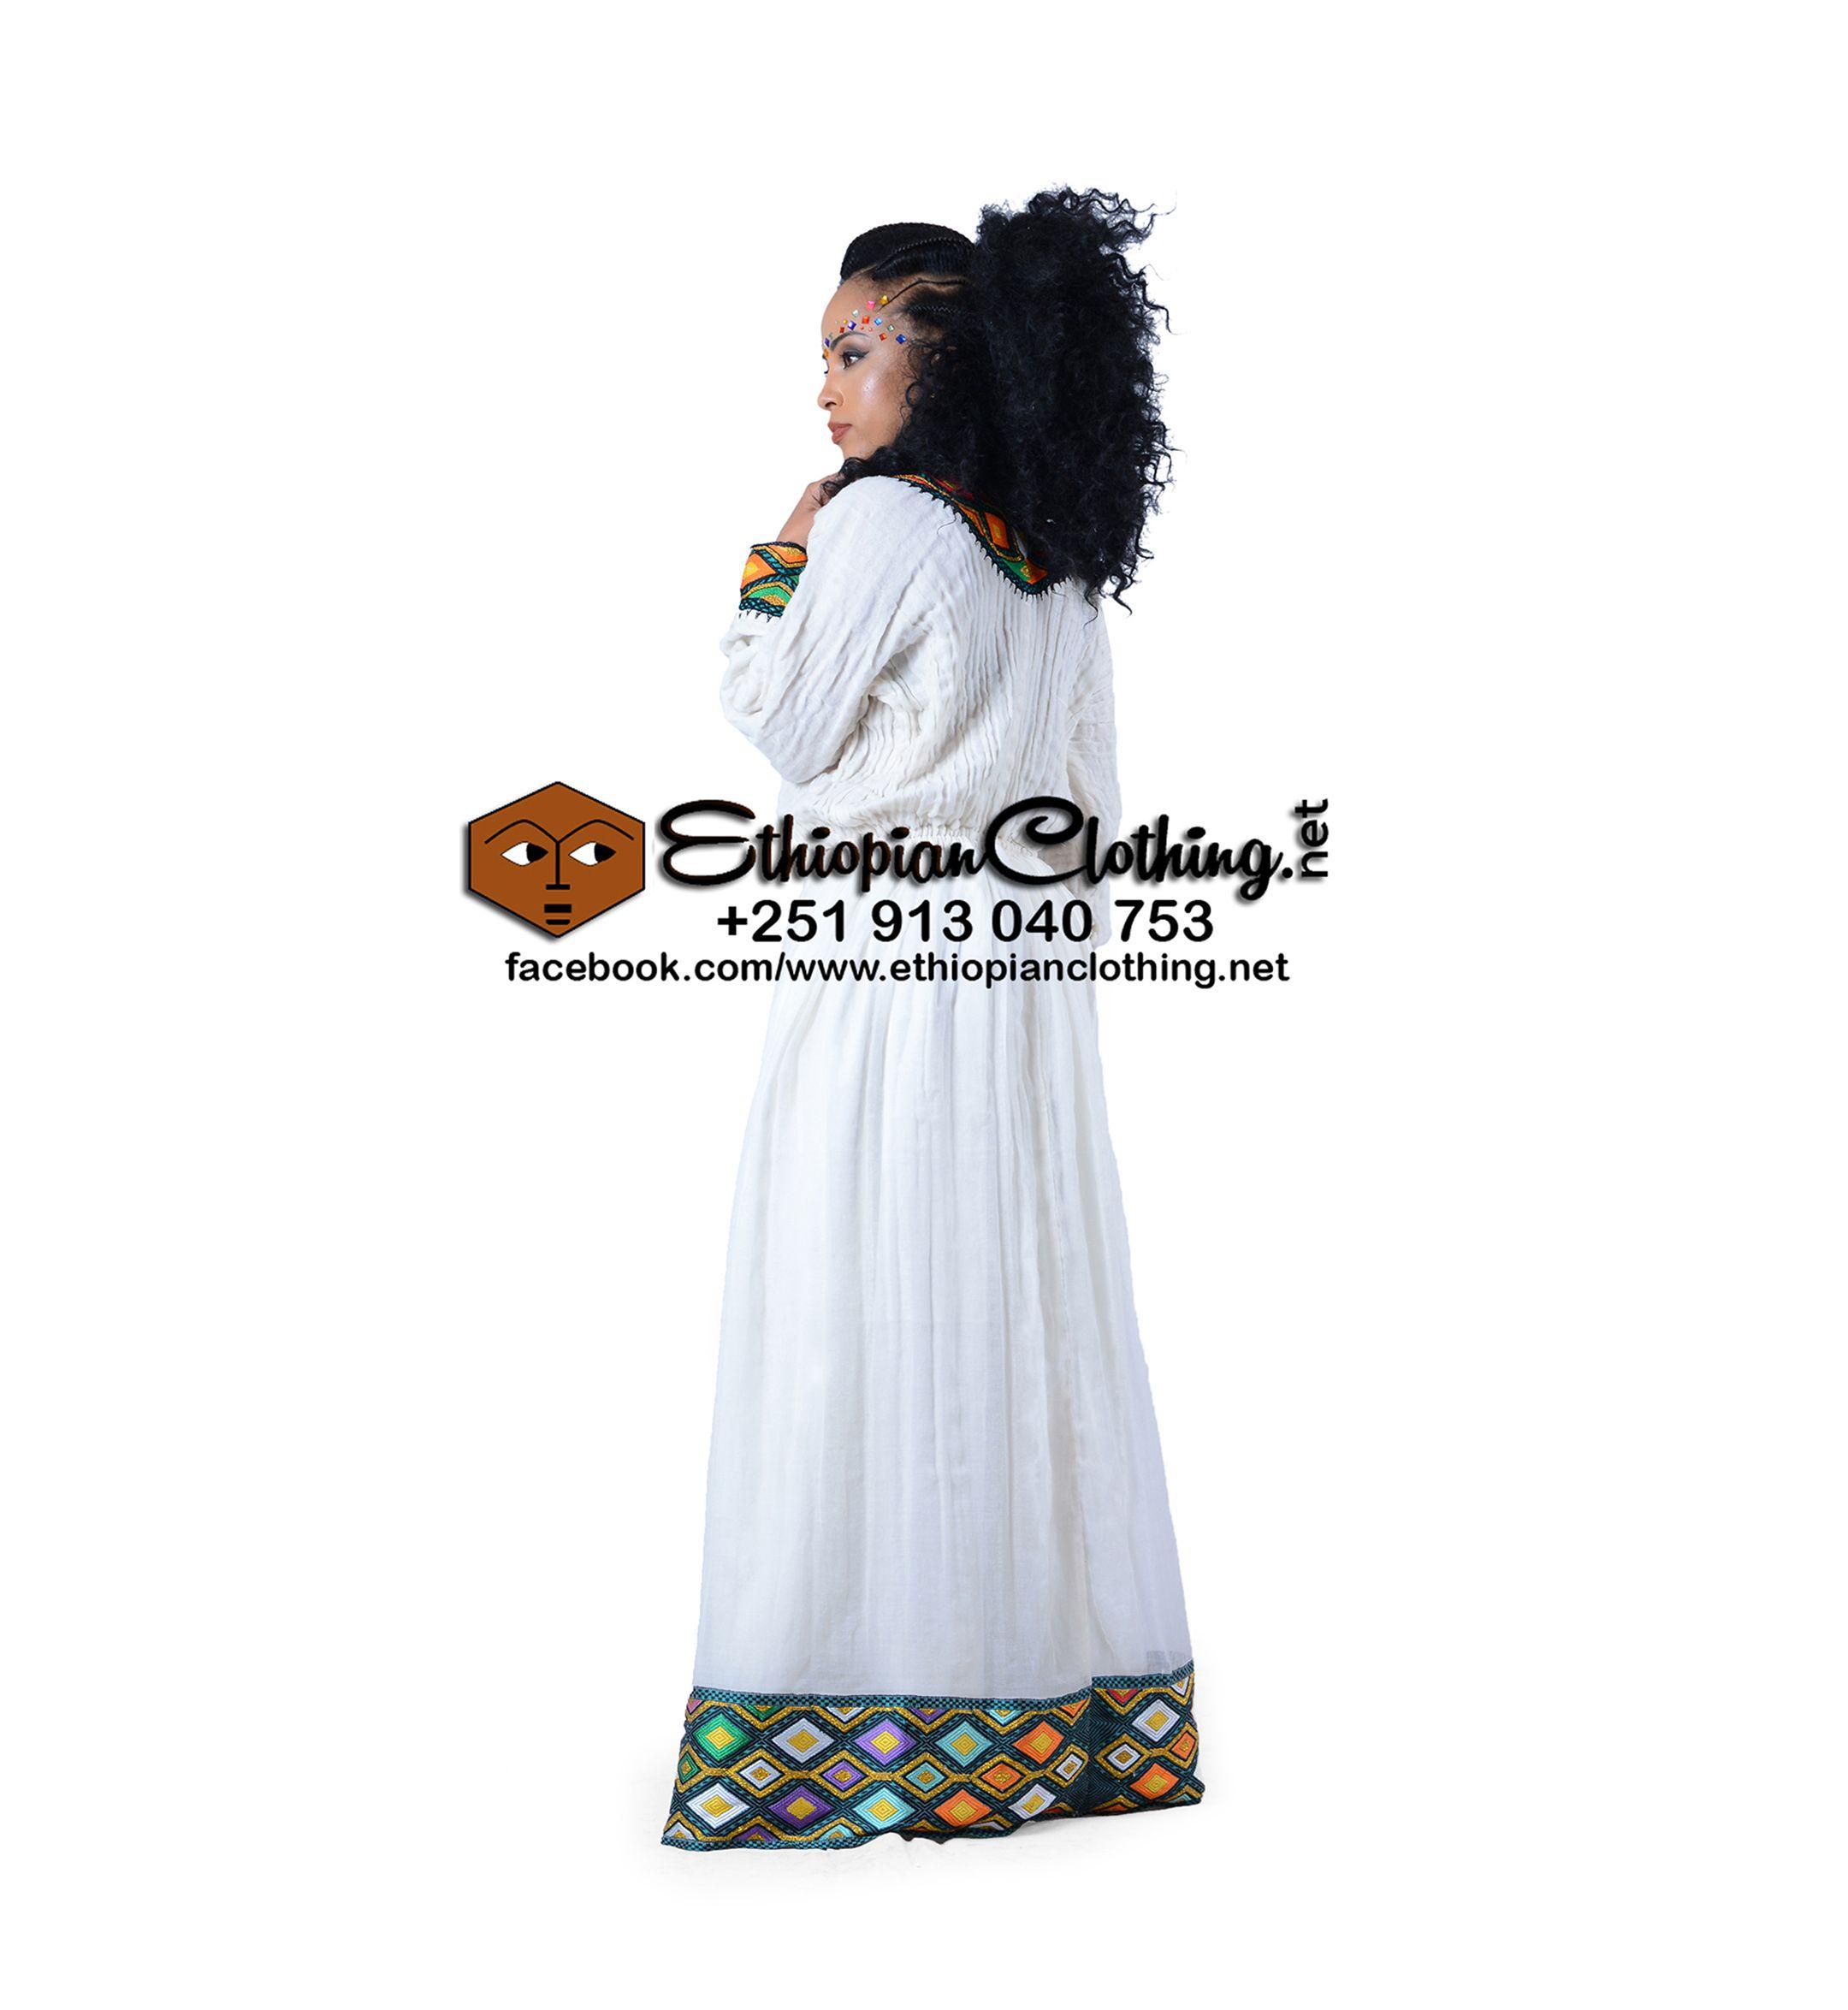 09462227aa2 ethiopian clothing traditional ethiopian clothing dresses ethiopian clothing  men ethiopian clothing crosses ethiopian clothing shops ethiopian clothing  ...